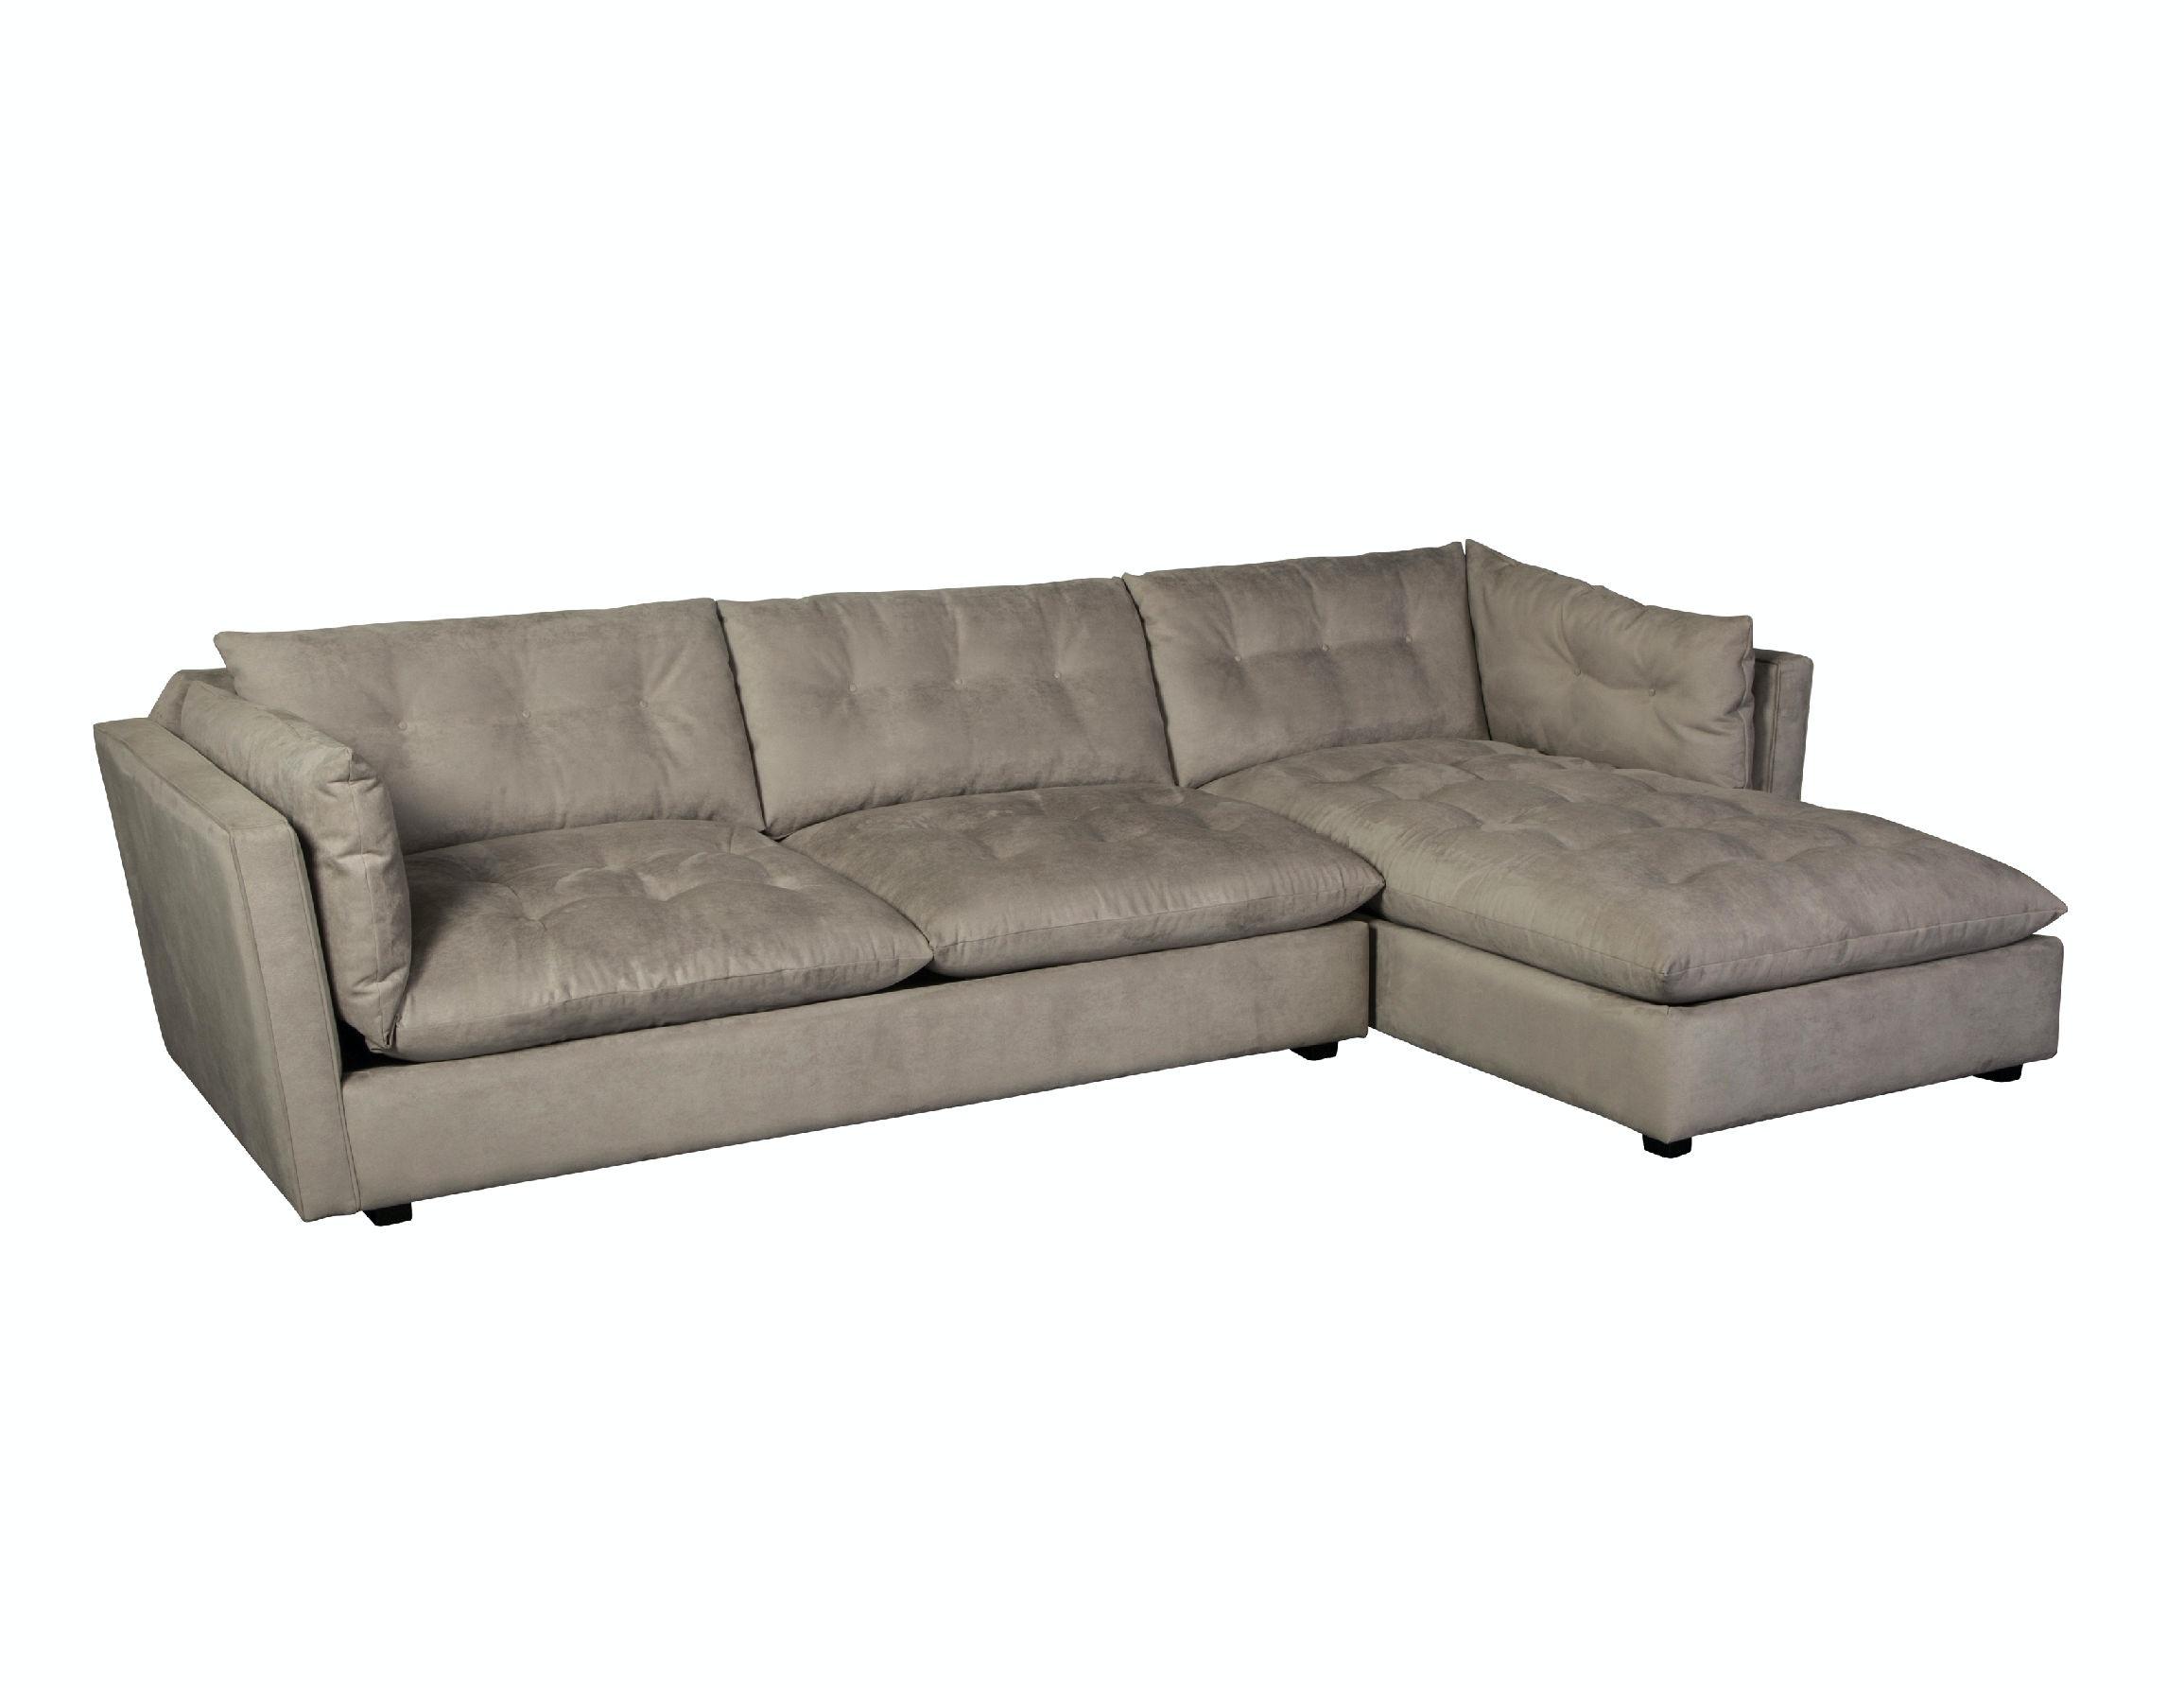 sectional sofa dallas fort worth vegan leather uk jonathan louis international living room biscayne